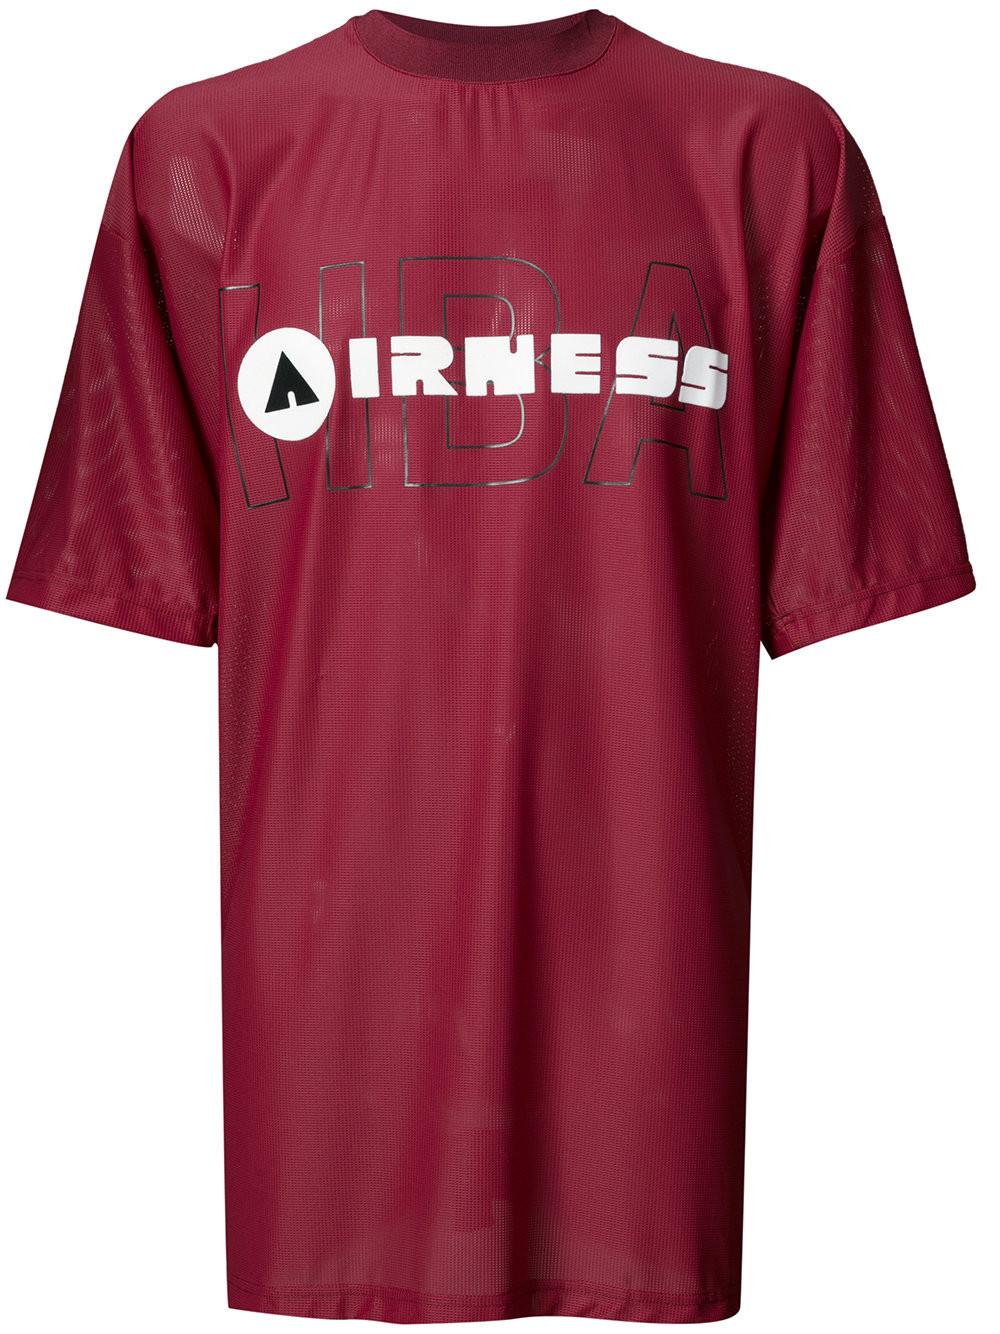 HOOD BY AIR Hood By Air Irness Print T-Shirt - Red